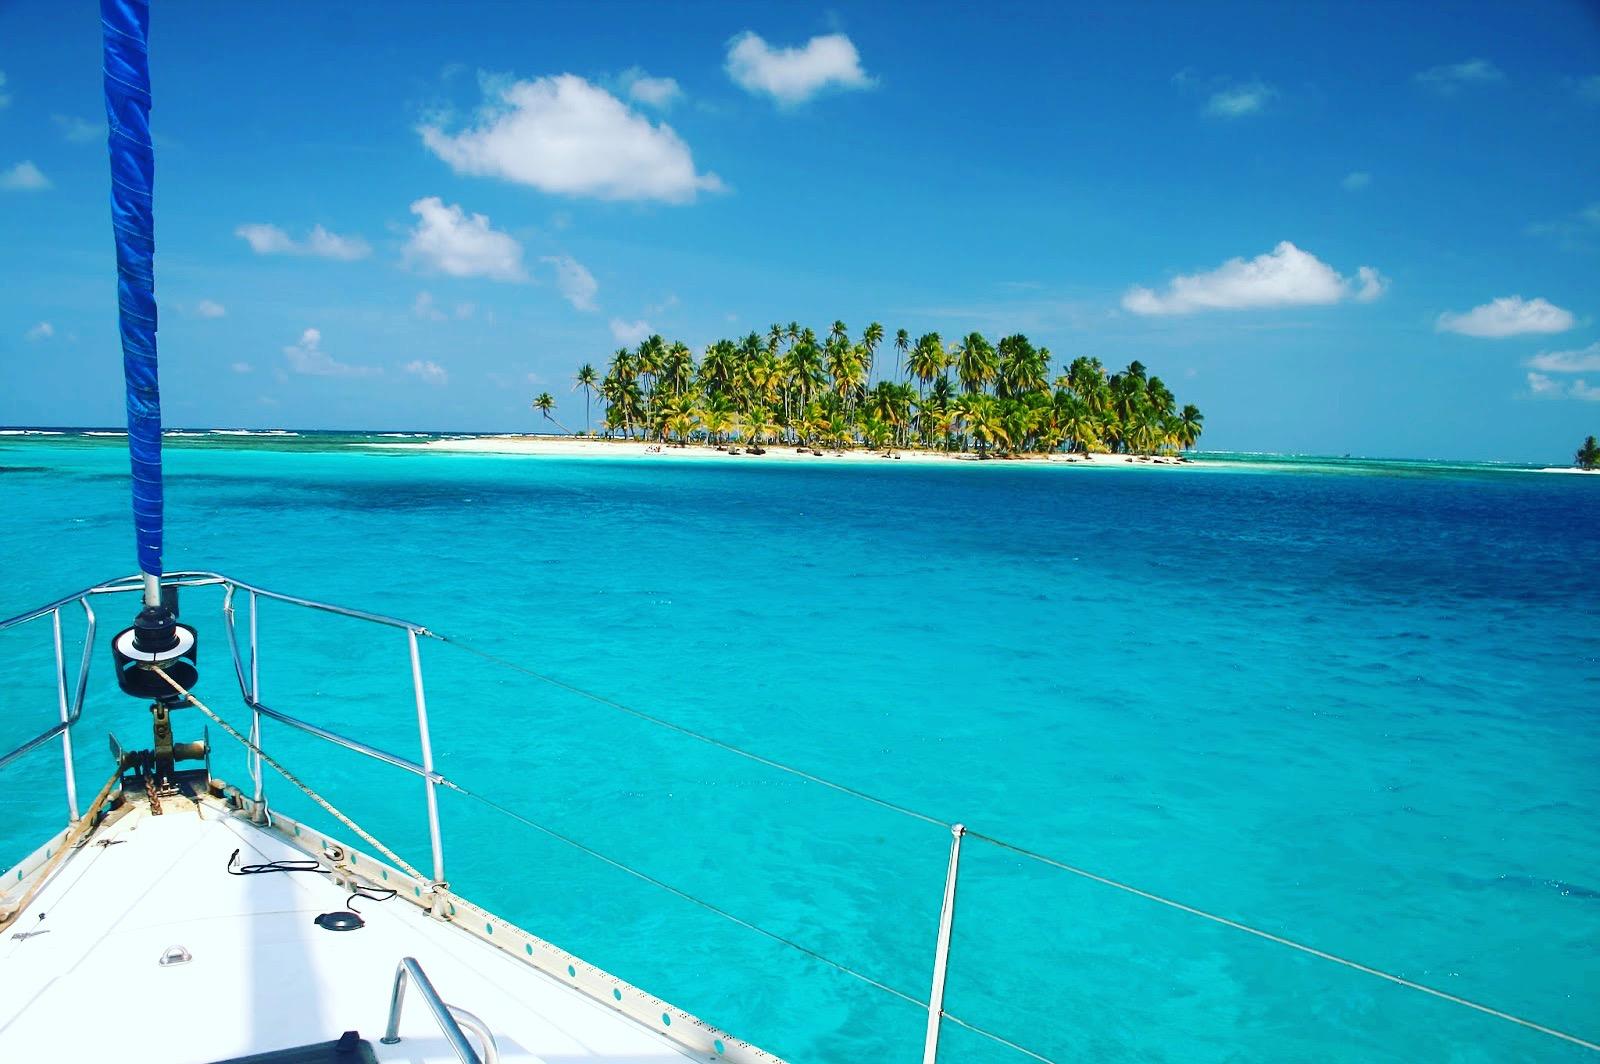 Yanpy Post 180 Sailing Caribbean 3